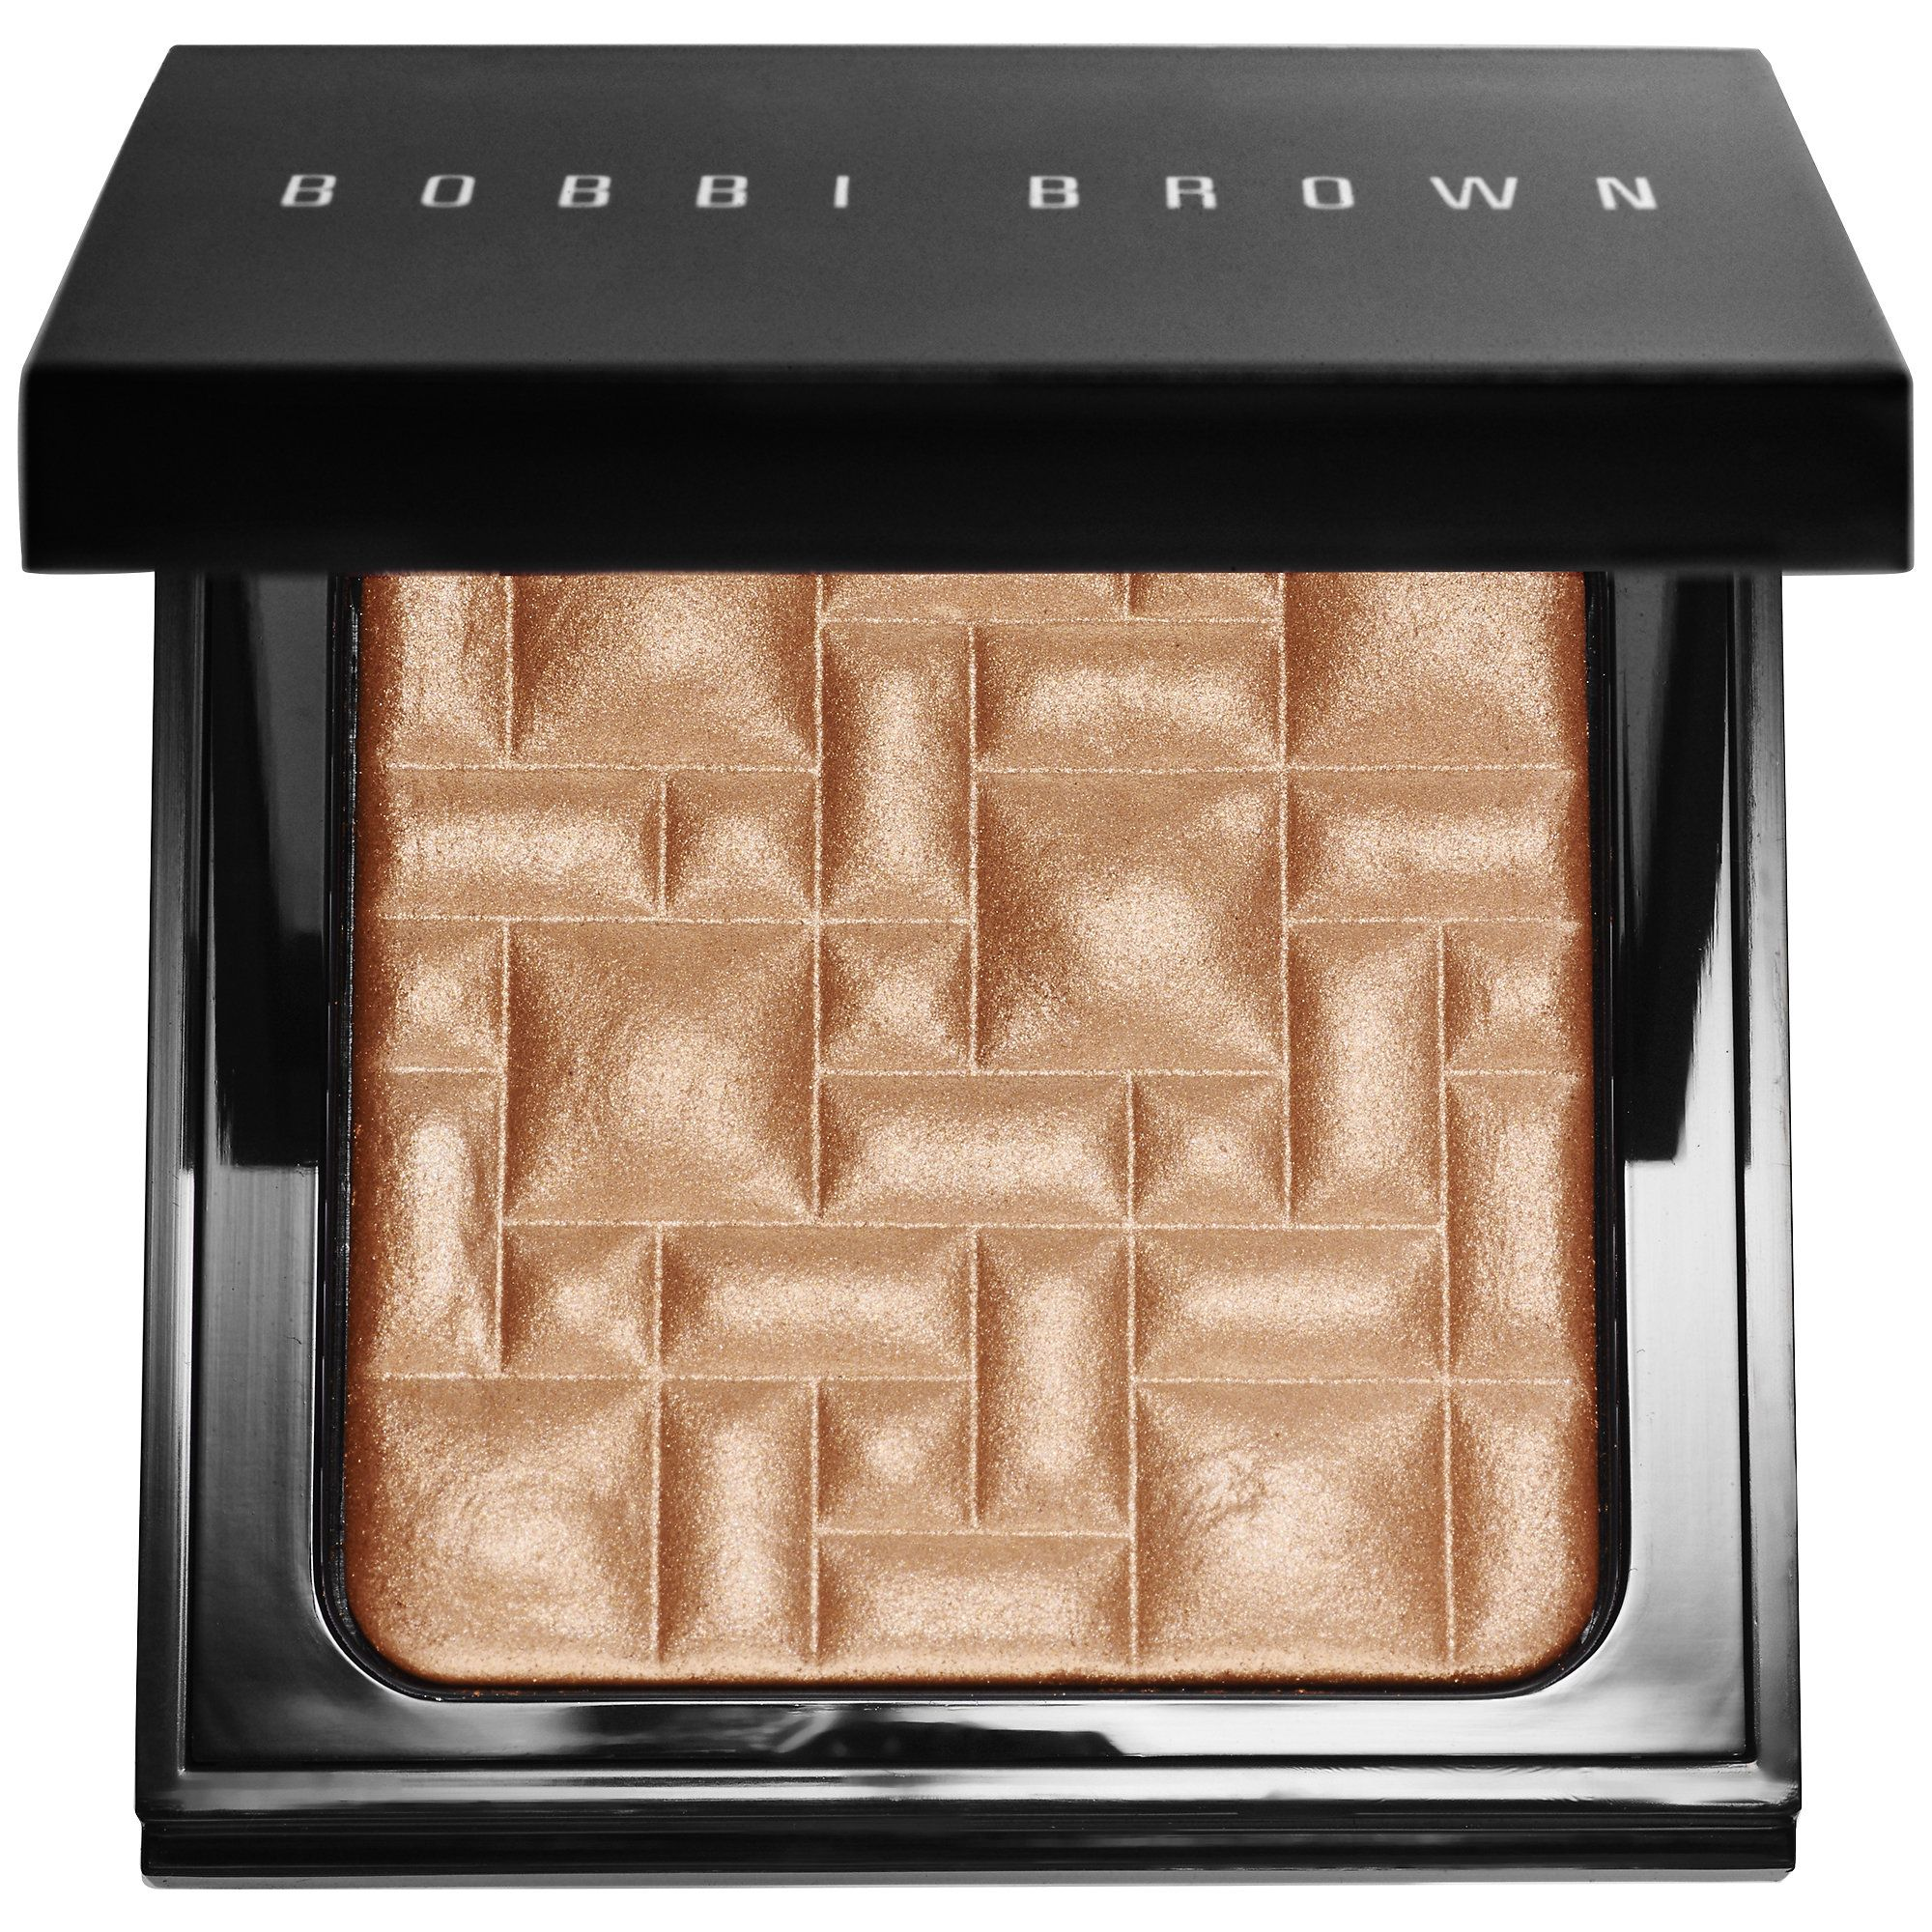 Highlighting Powder Bobbi Brown Sephora Best Makeup Brands Highlighter For Dark Skin Highlighter Makeup